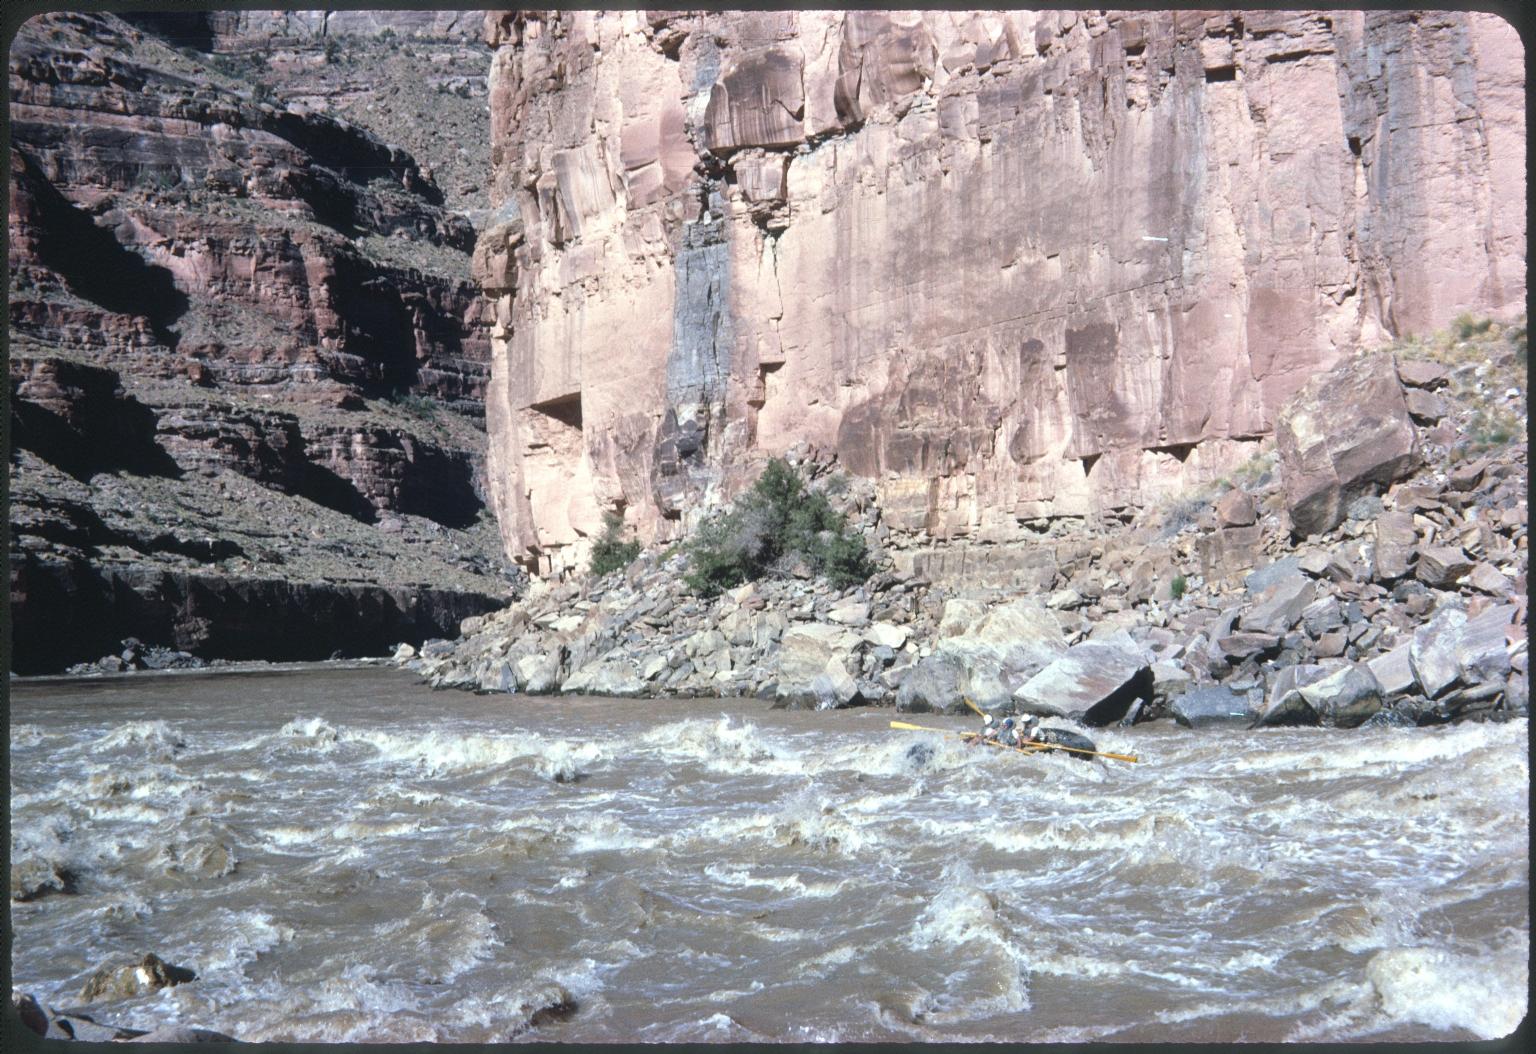 Rafters navigating Dark Canyon Rapids